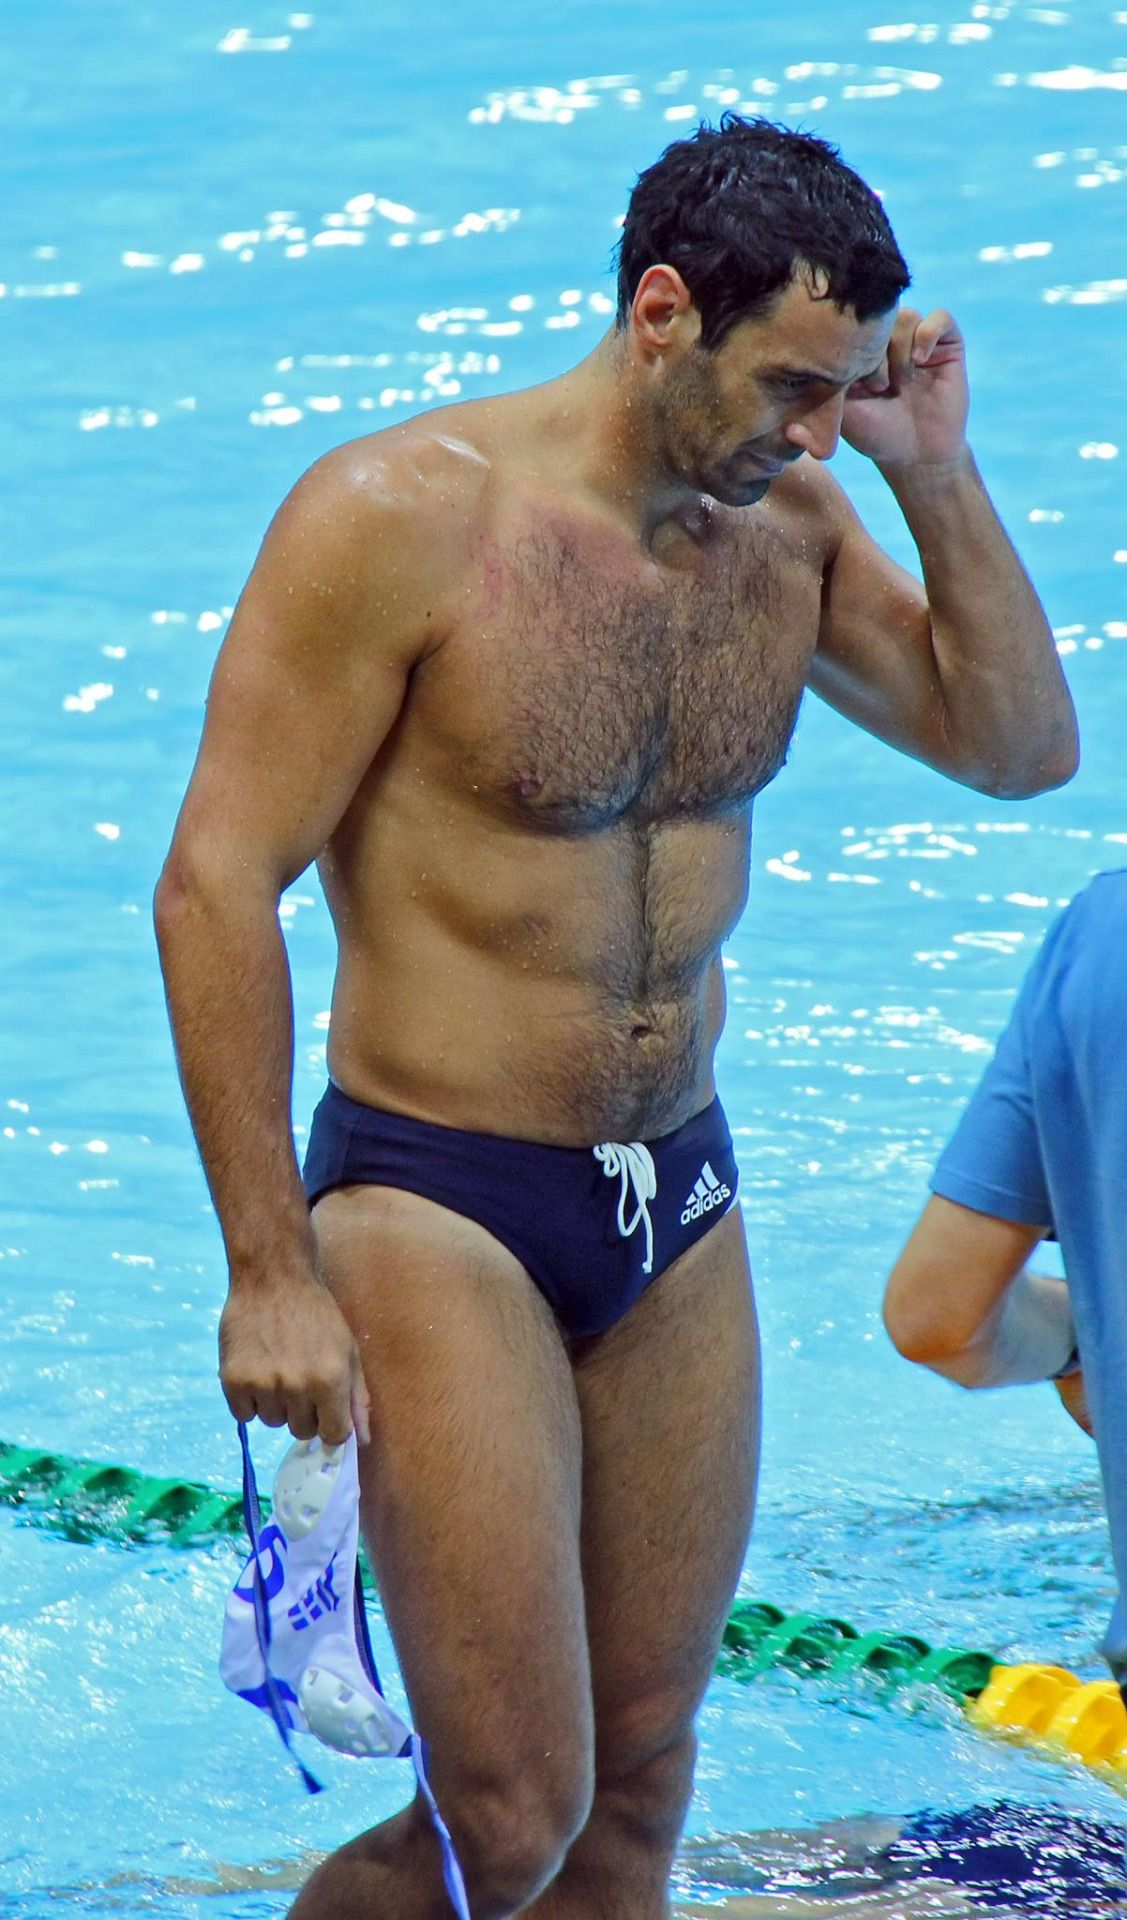 Giorgios Afroudakis Photo By Sredni Vastar Water Polo Speedo Water Polo Players